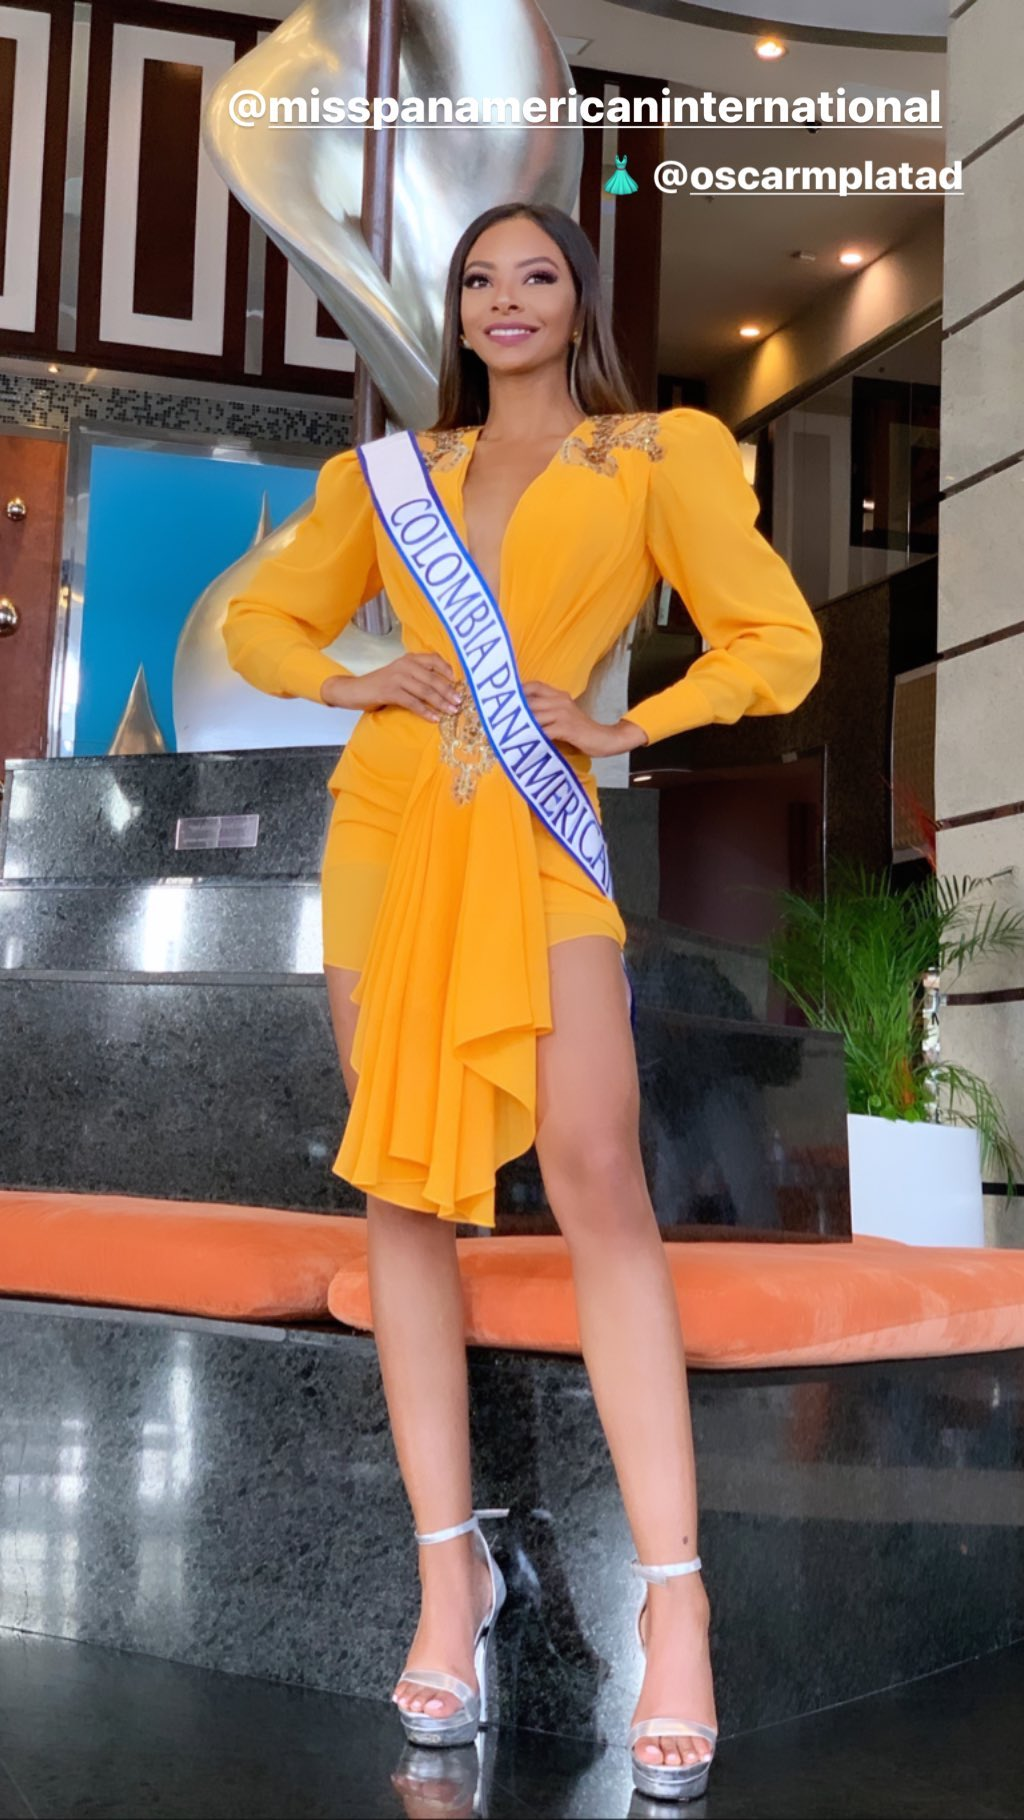 candidatas a miss panamerican international 2019. final: 2 nov. sede: guadalajara. - Página 9 1yrh2F